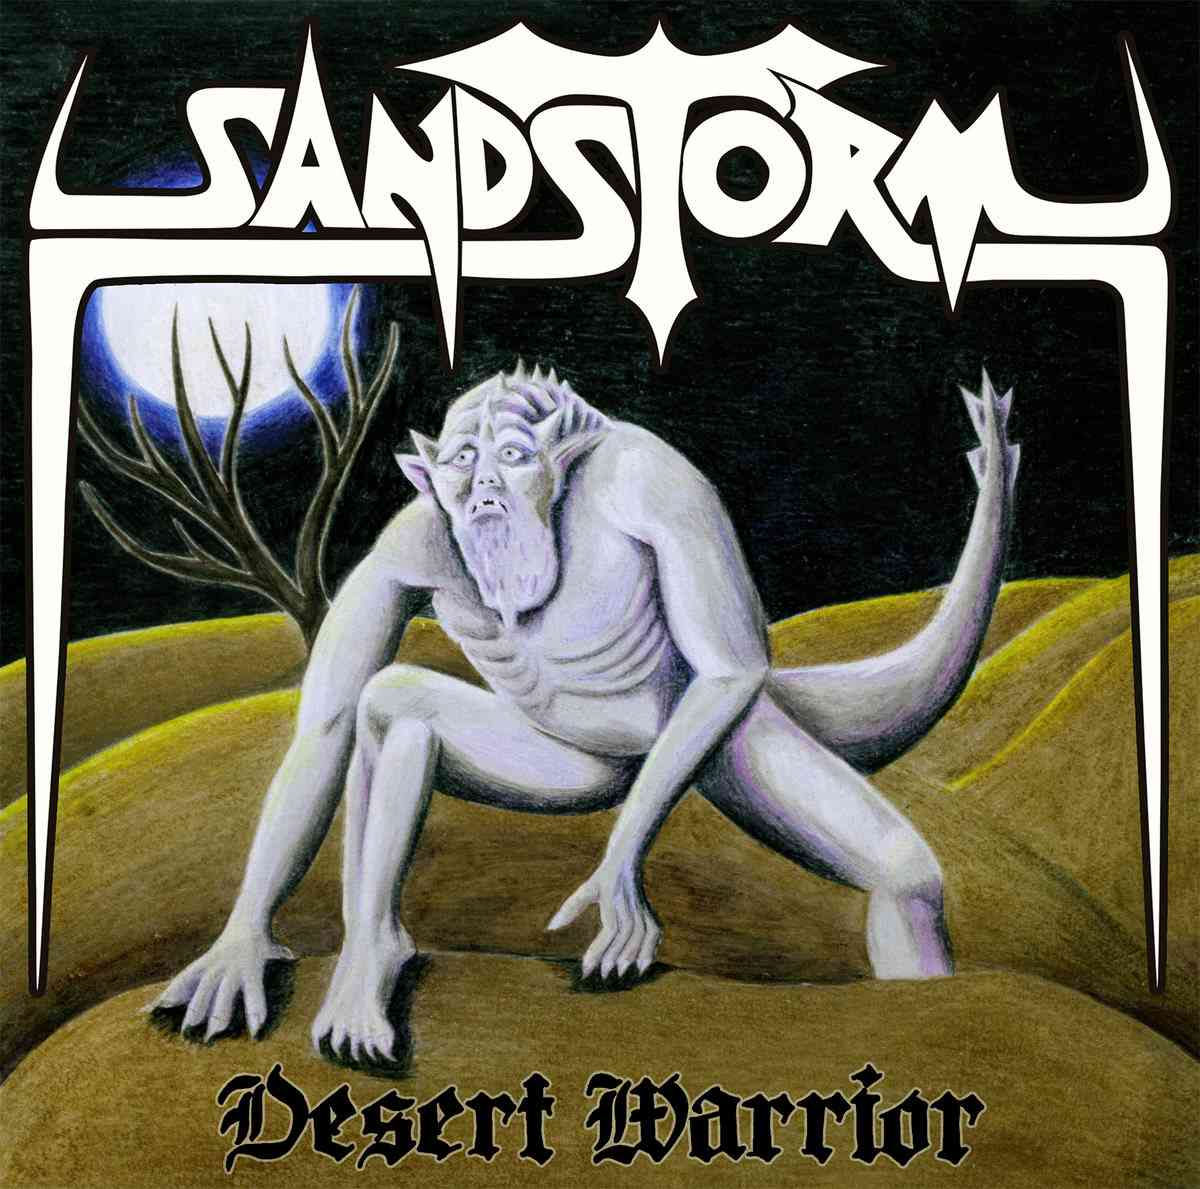 Sandstorm - Desert Warrior - album cover